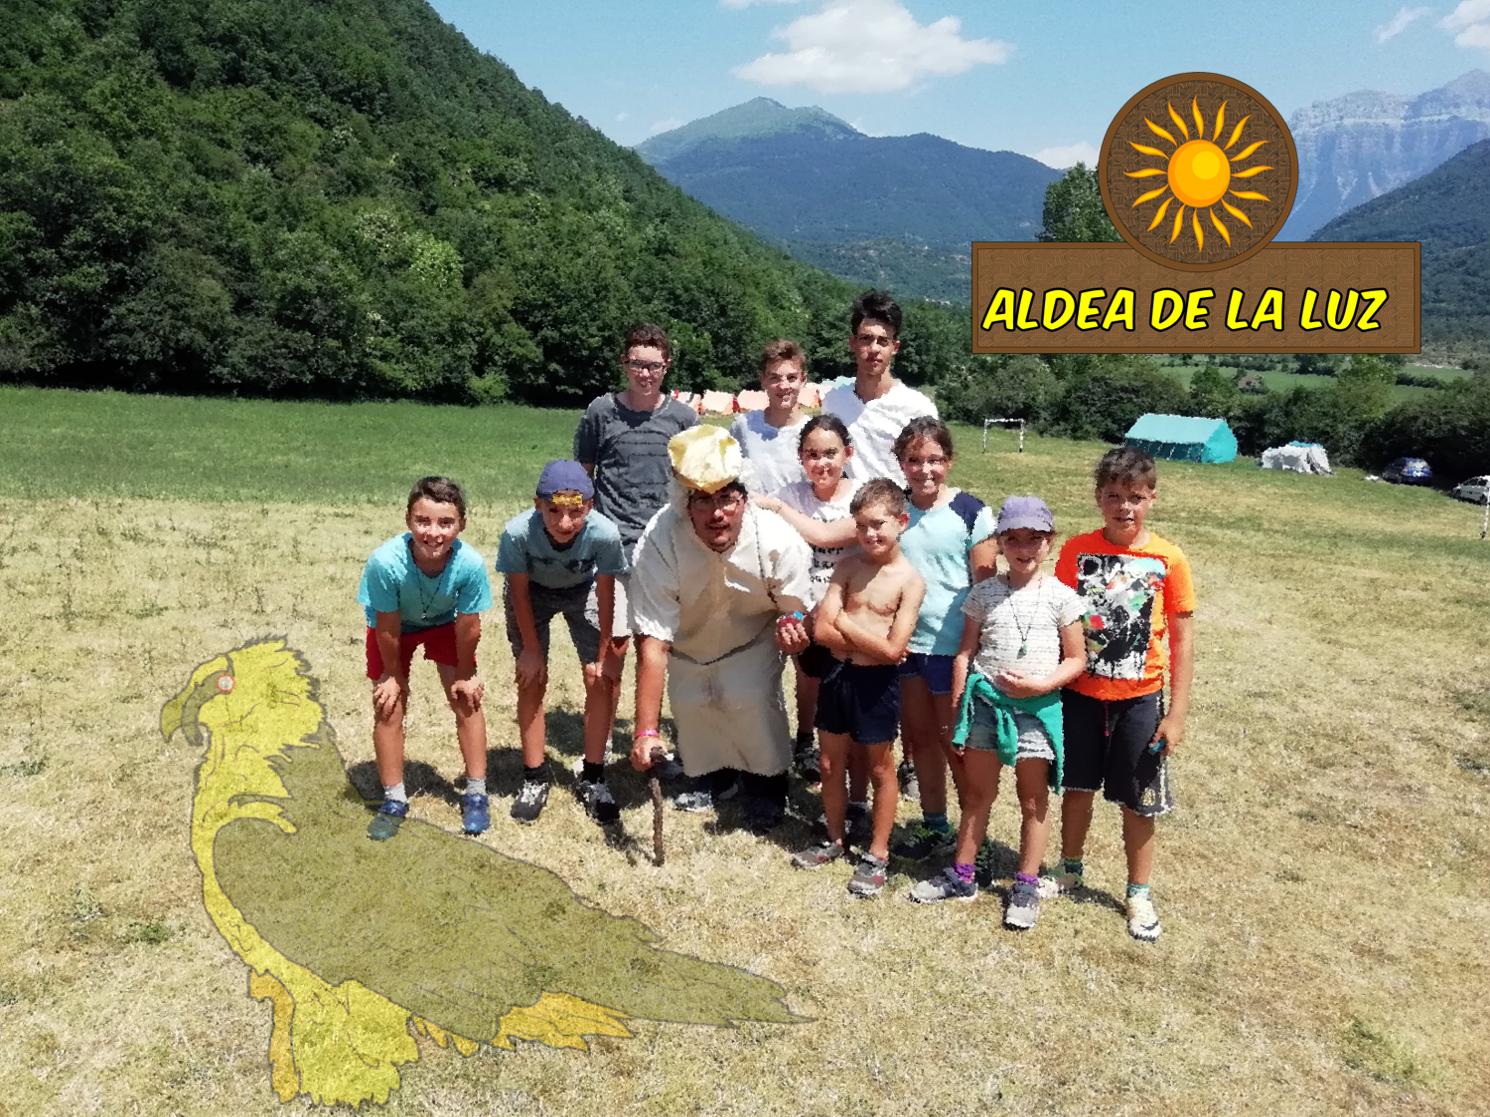 Aldea de la luz | Campamento Turquino 2018: la leyenda de Ordesa